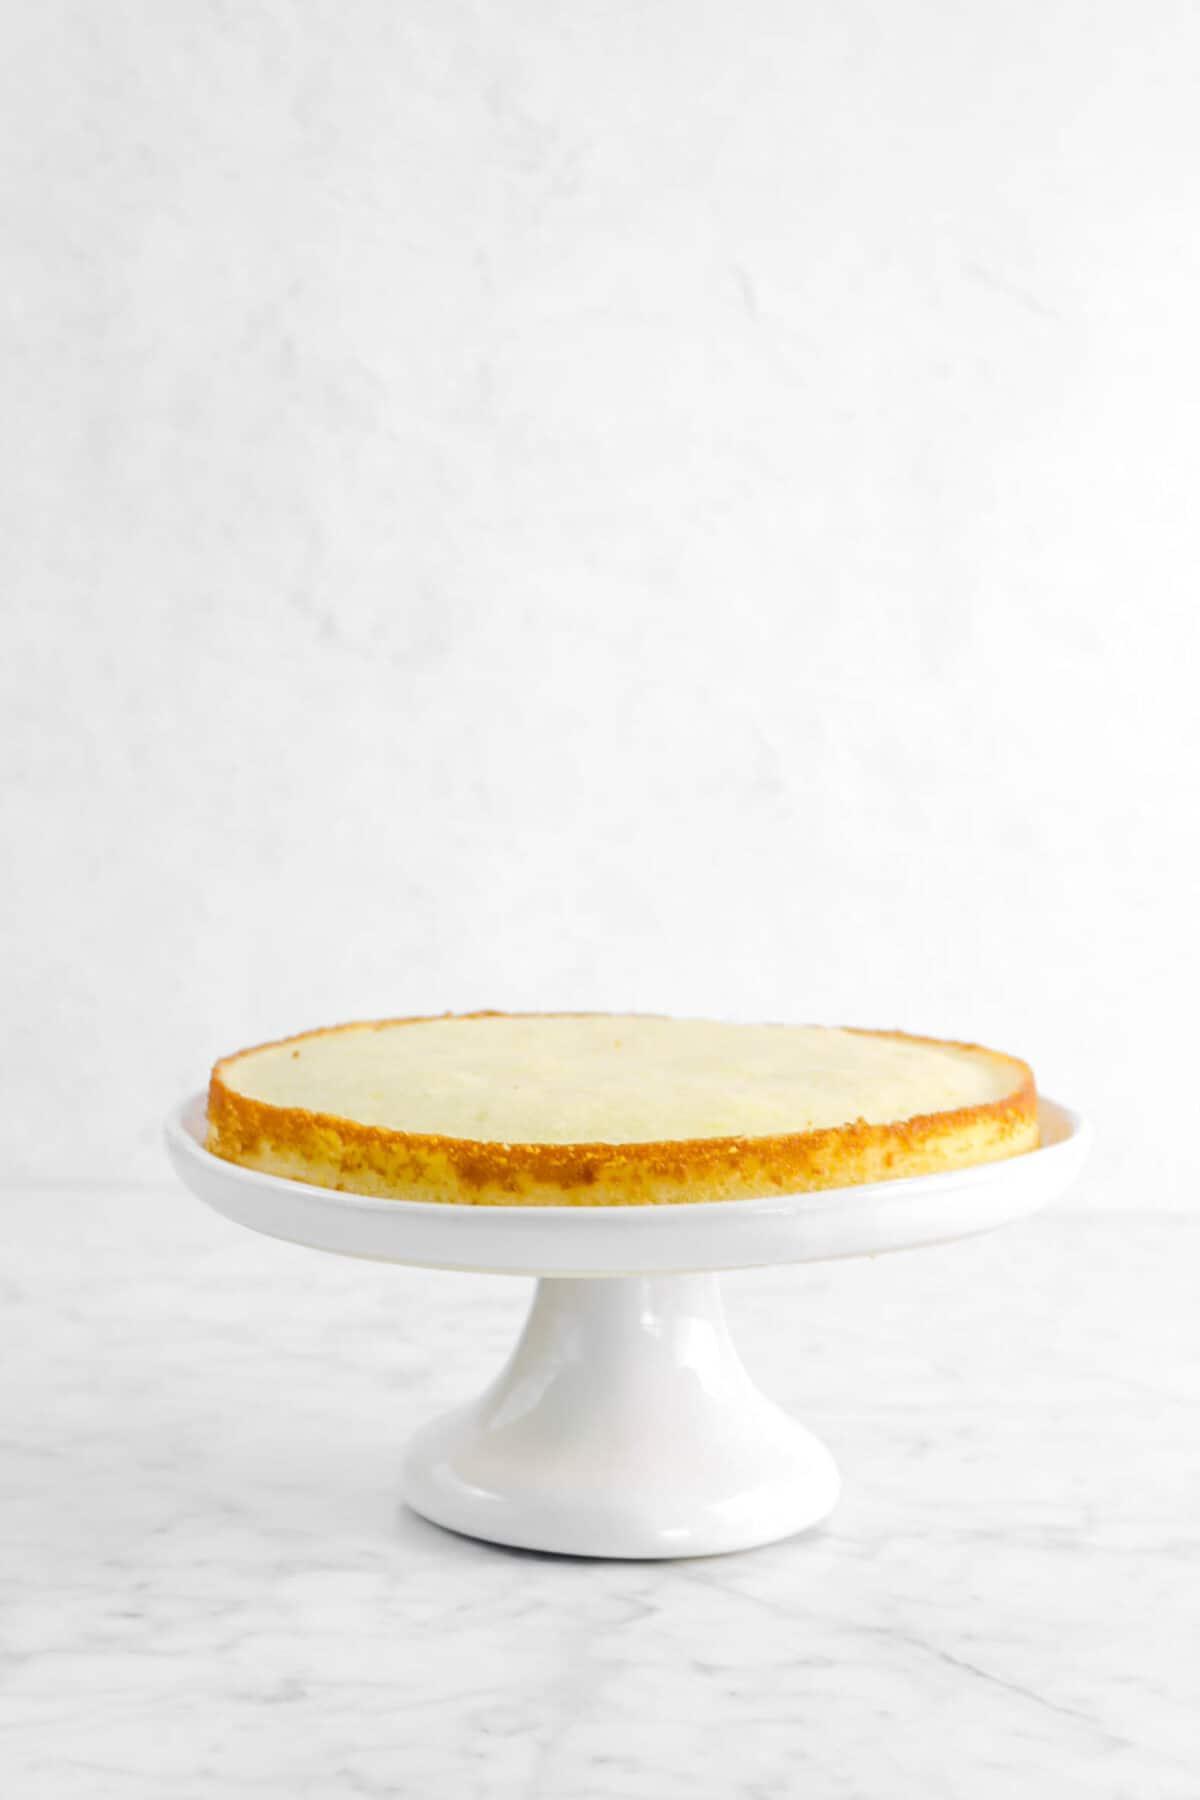 lemon cake layer on white cake stand